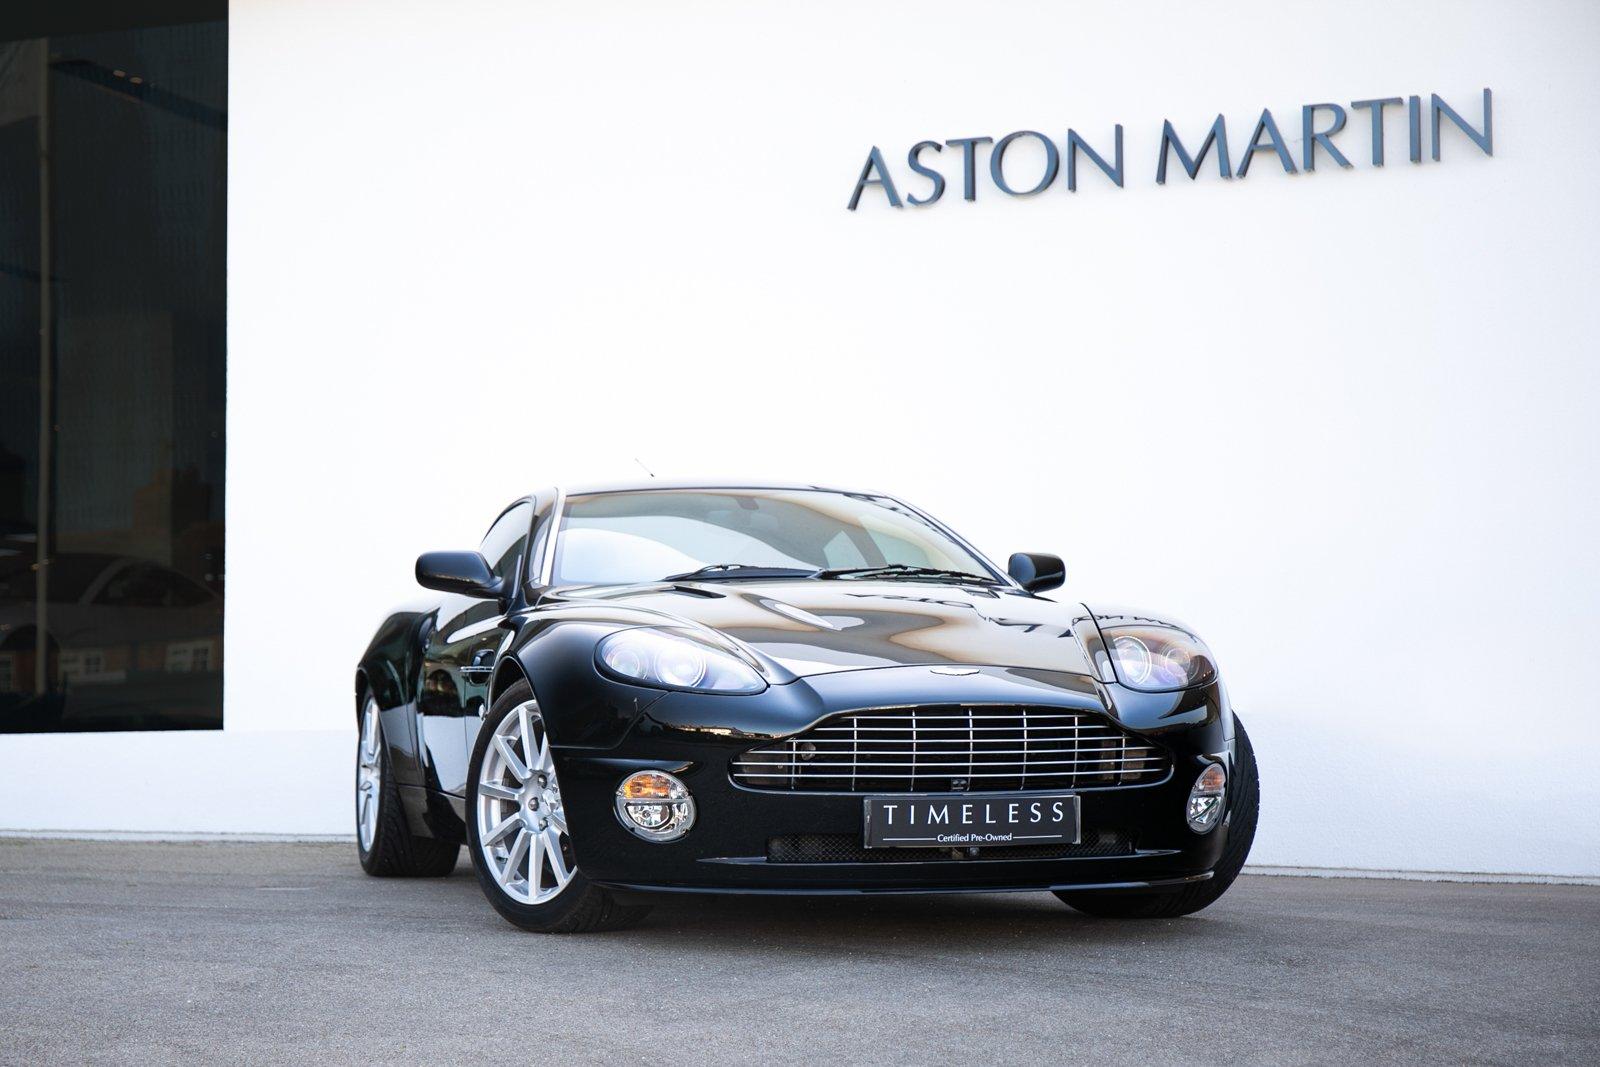 2007 Aston Martin Vanquish S Coupe Ultimate Edition Classic Driver Market